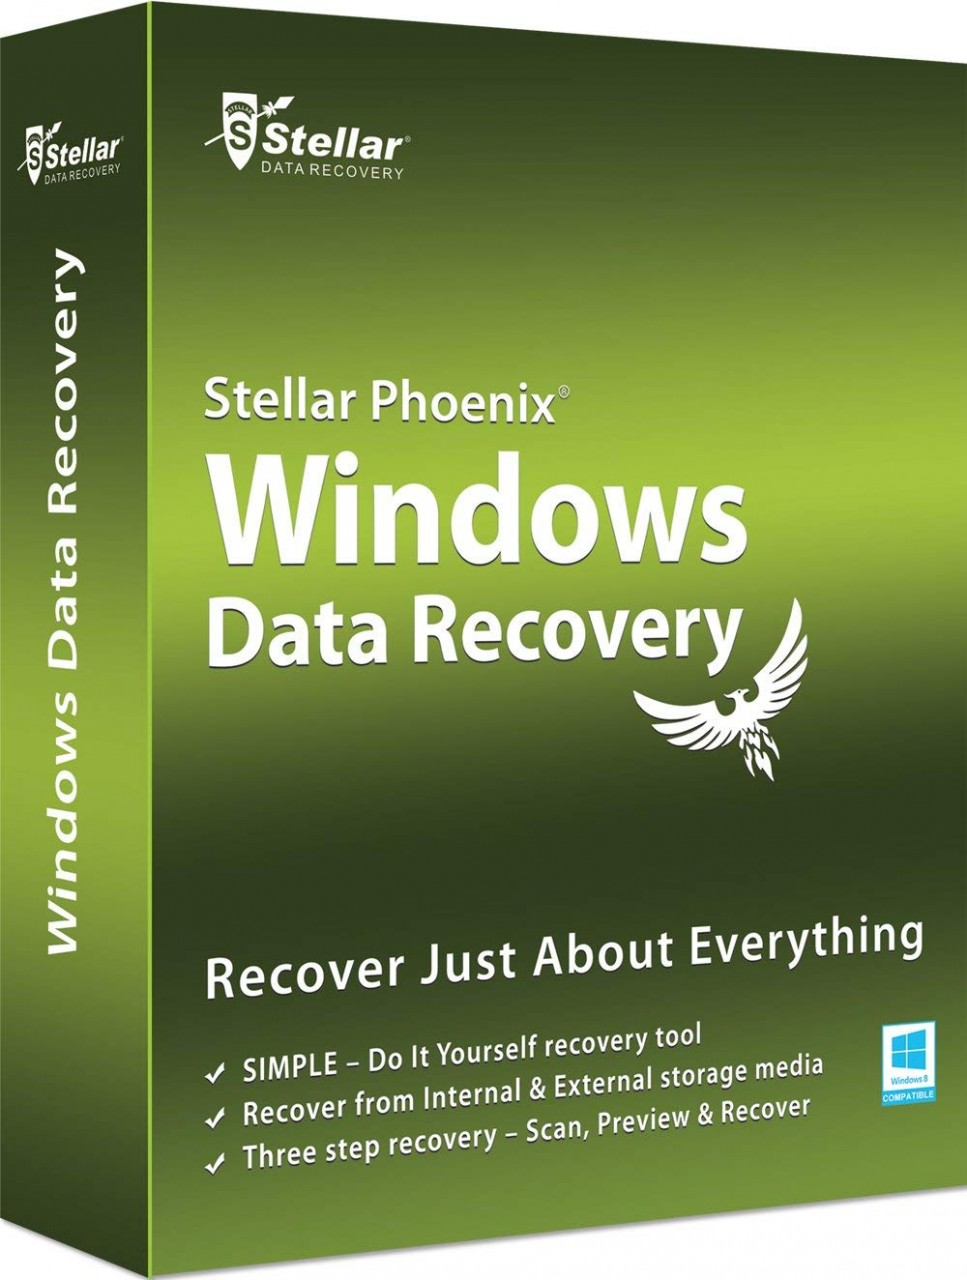 Stellar Phoenix Data Recovery 6 Professional